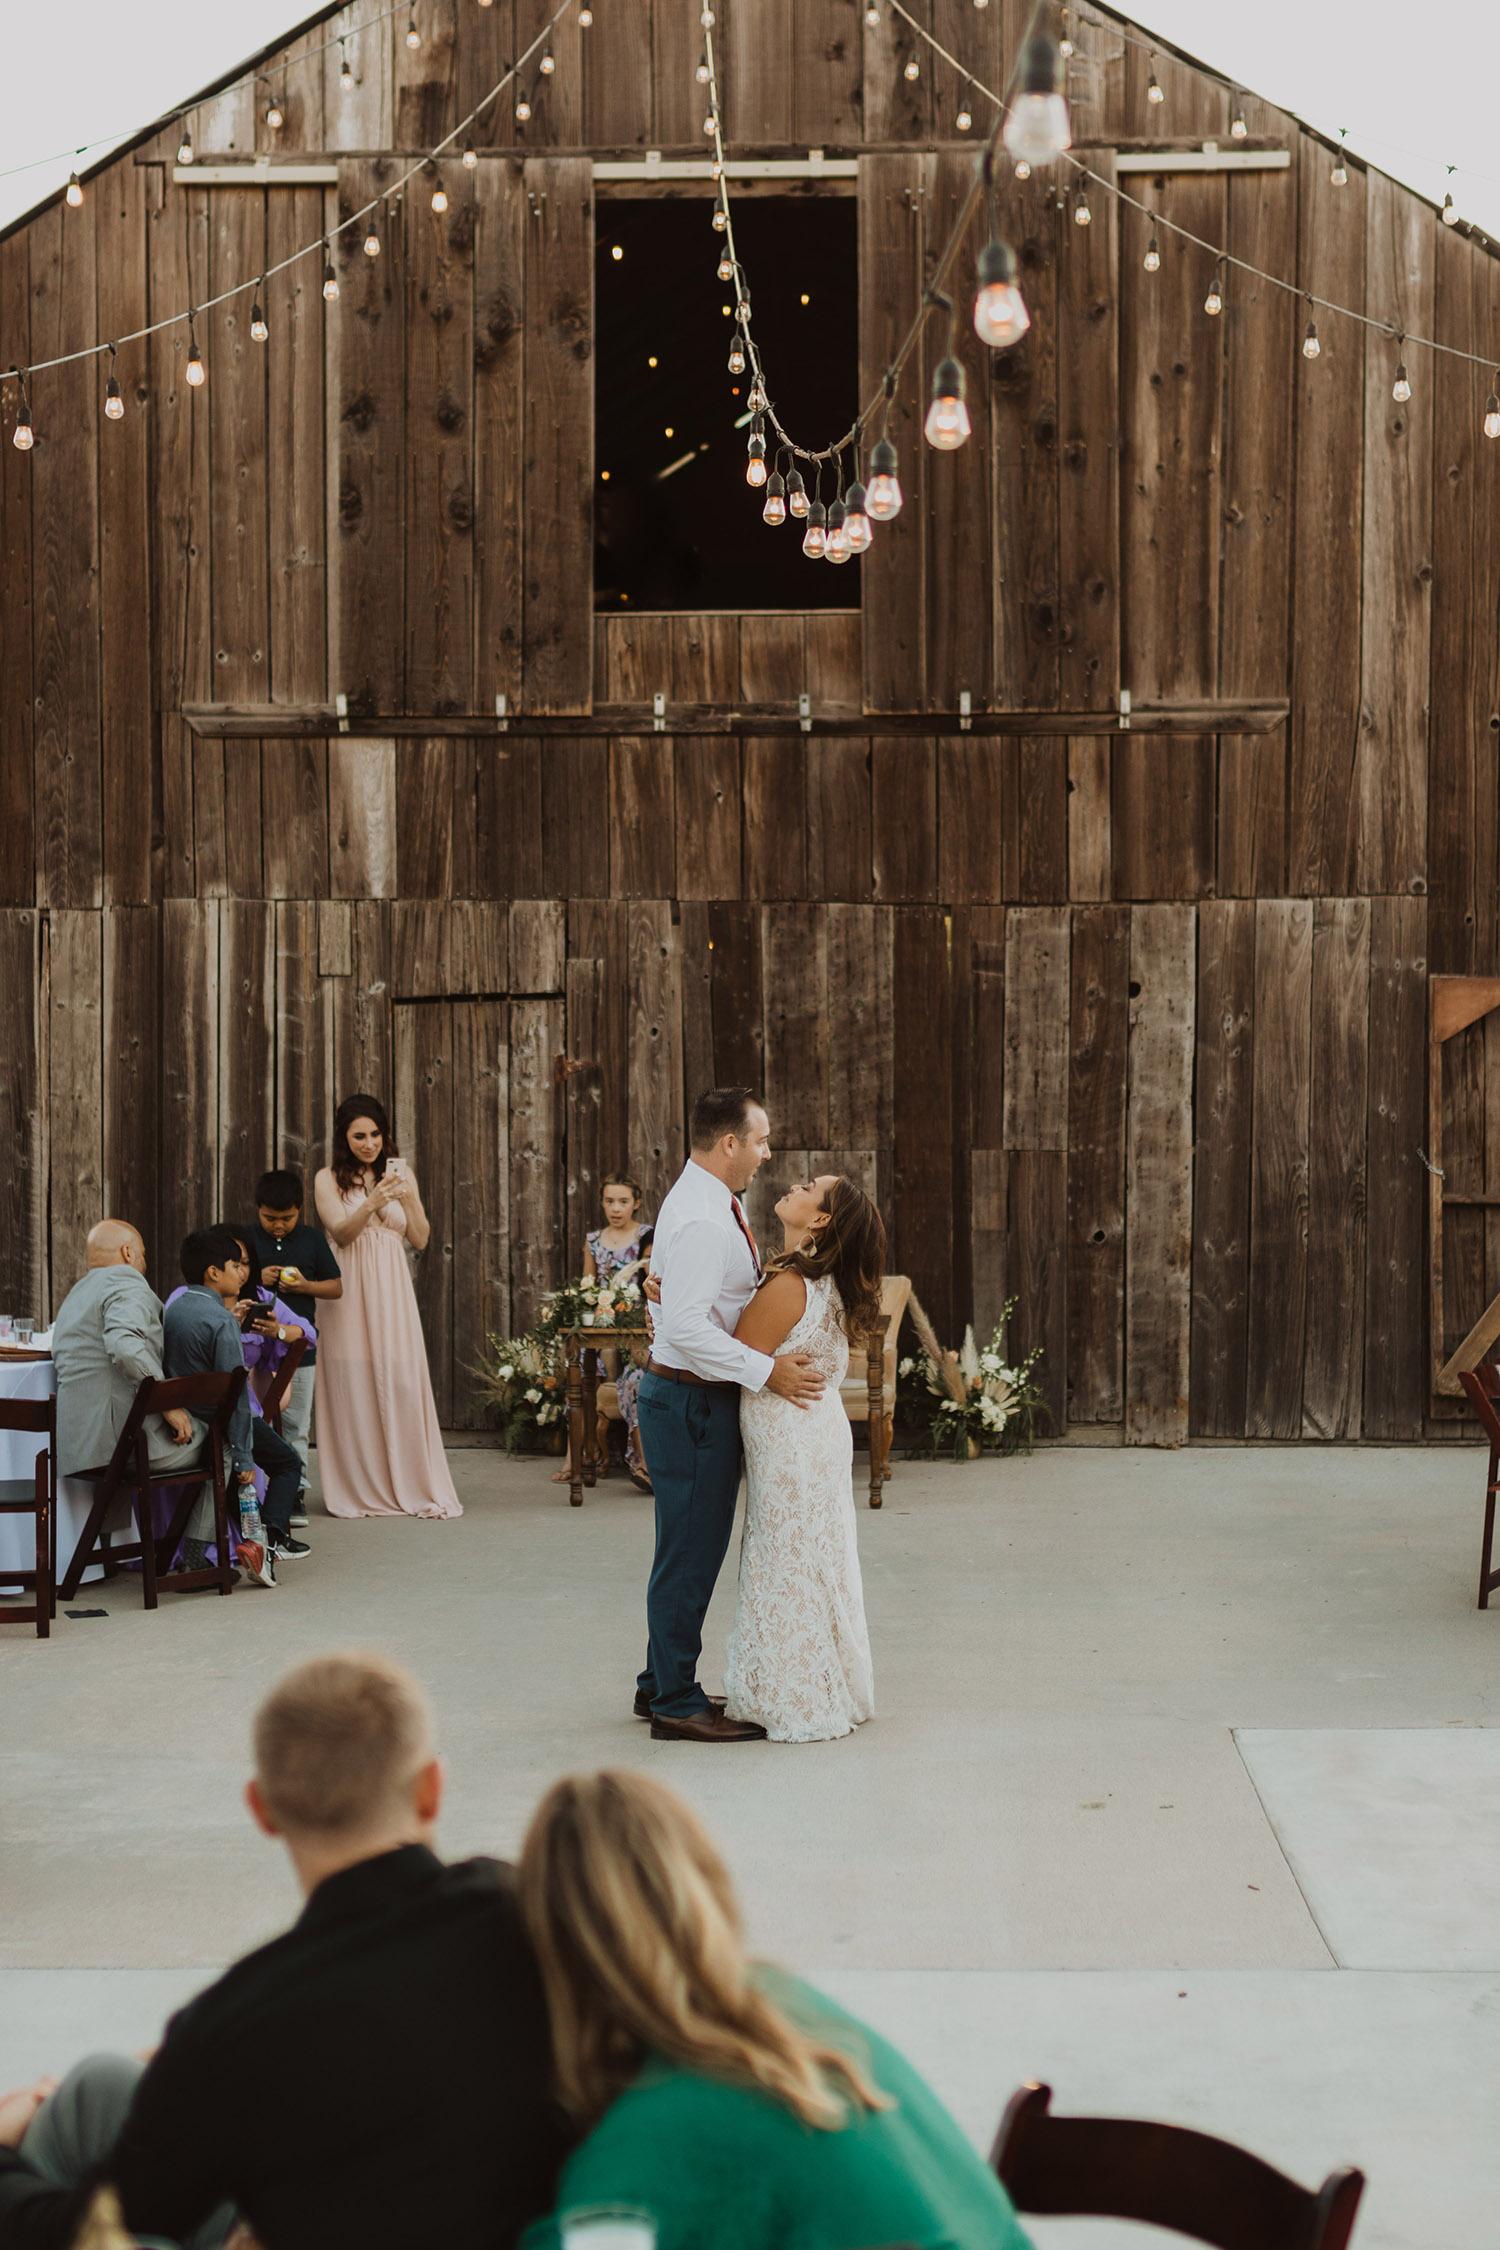 Milk+and+thistle+higuera+ranch+california+wedding+Tina+greg-2807.jpg